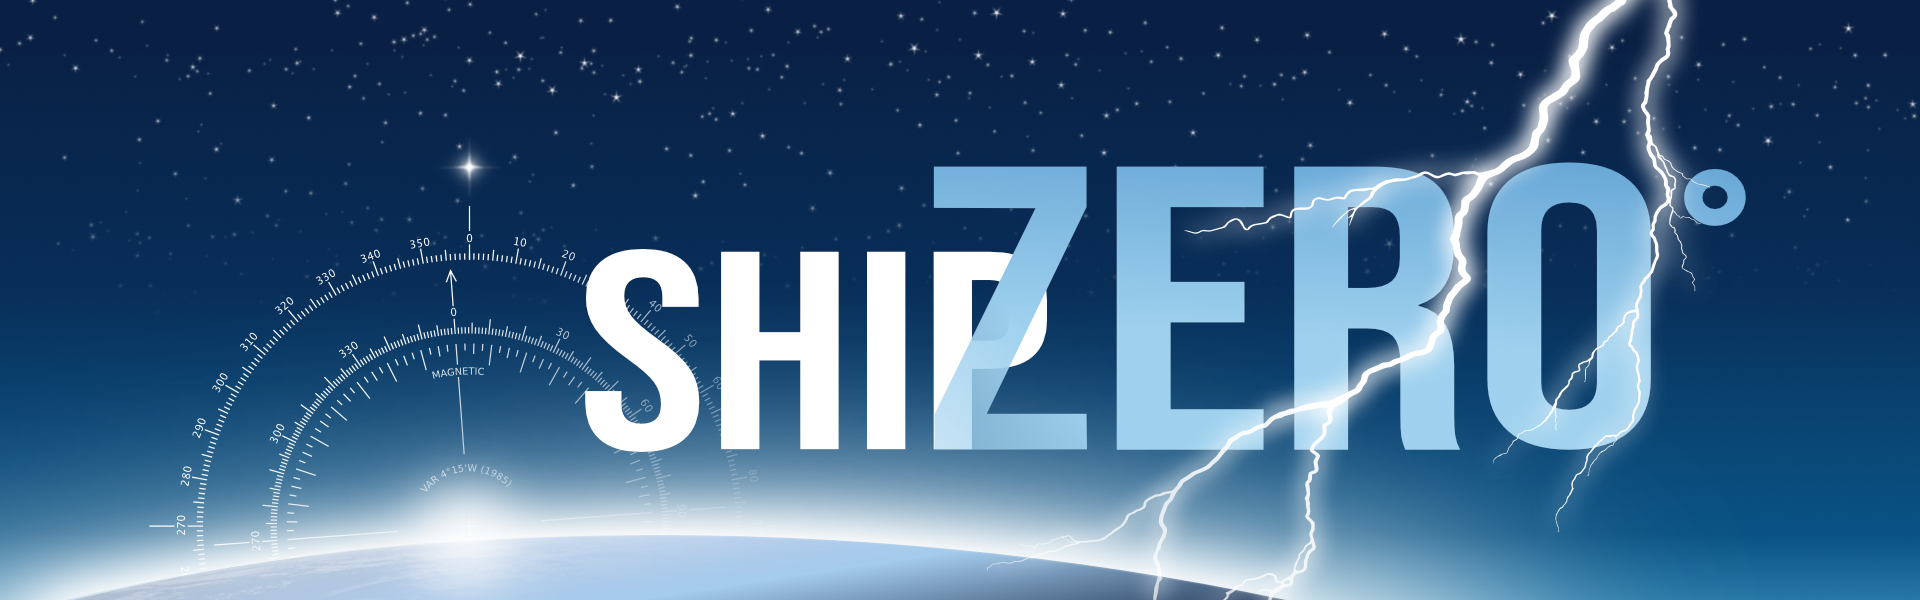 ZESTAs ShipZero